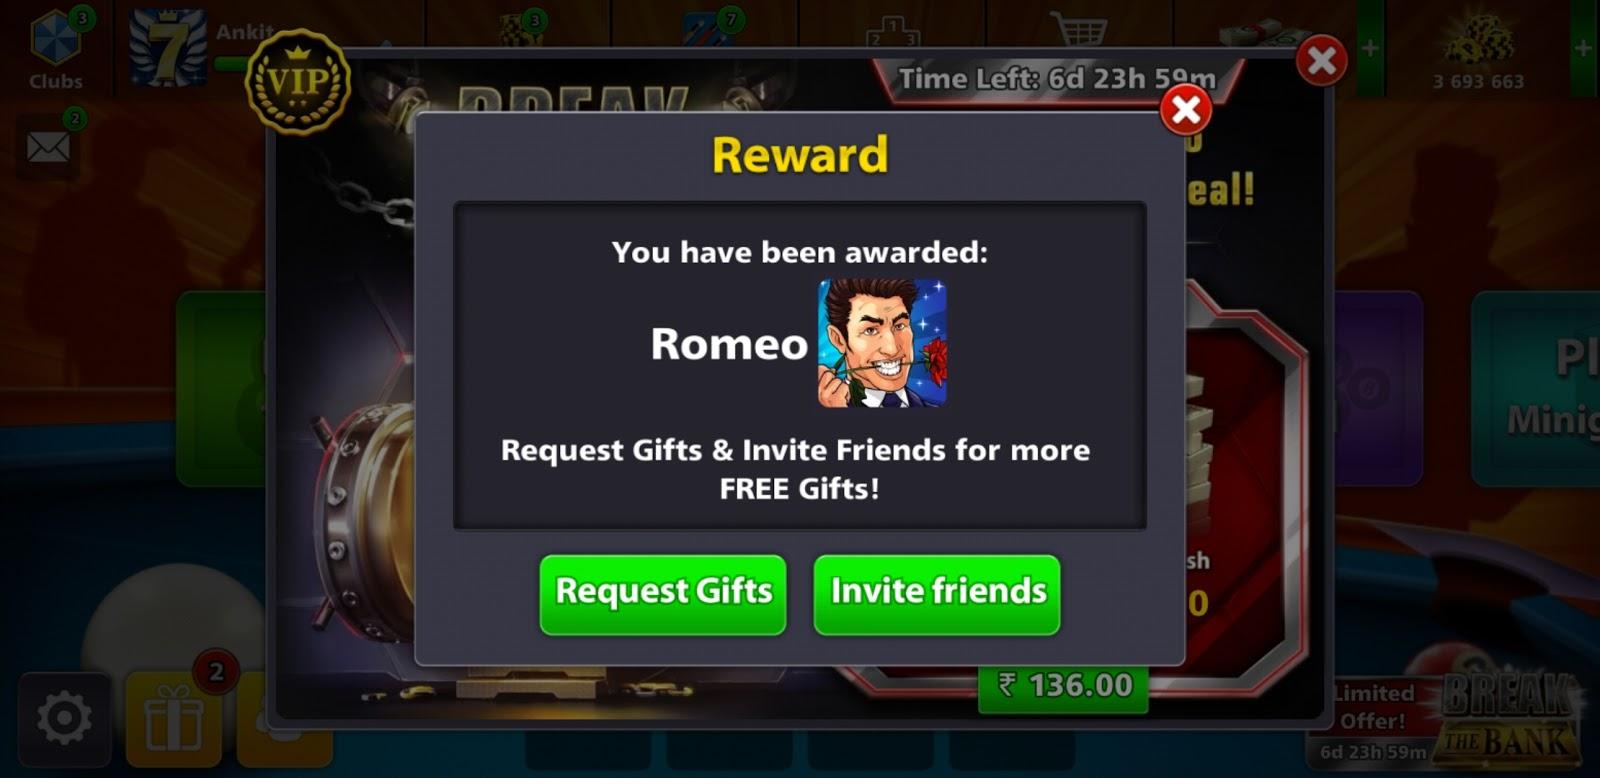 8Ball Pool New Reward Links